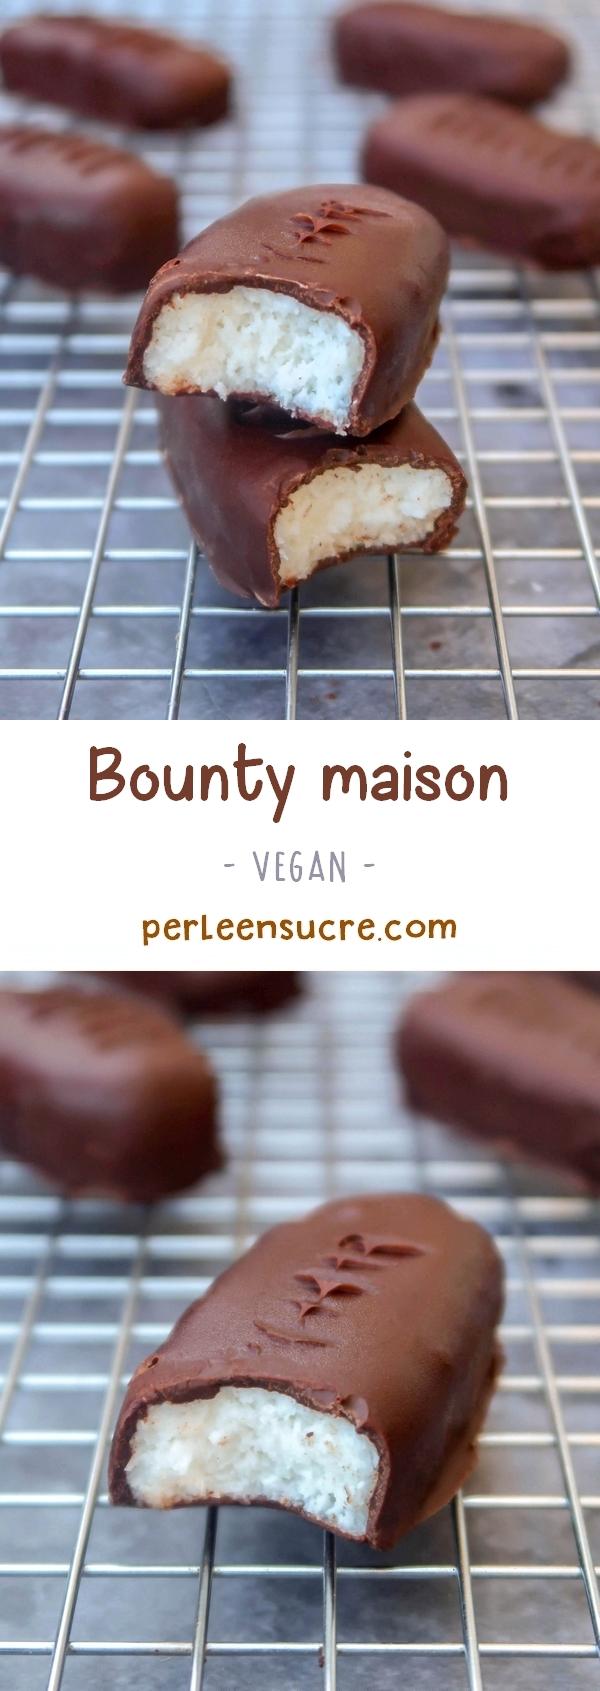 Bounty maison {vegan}